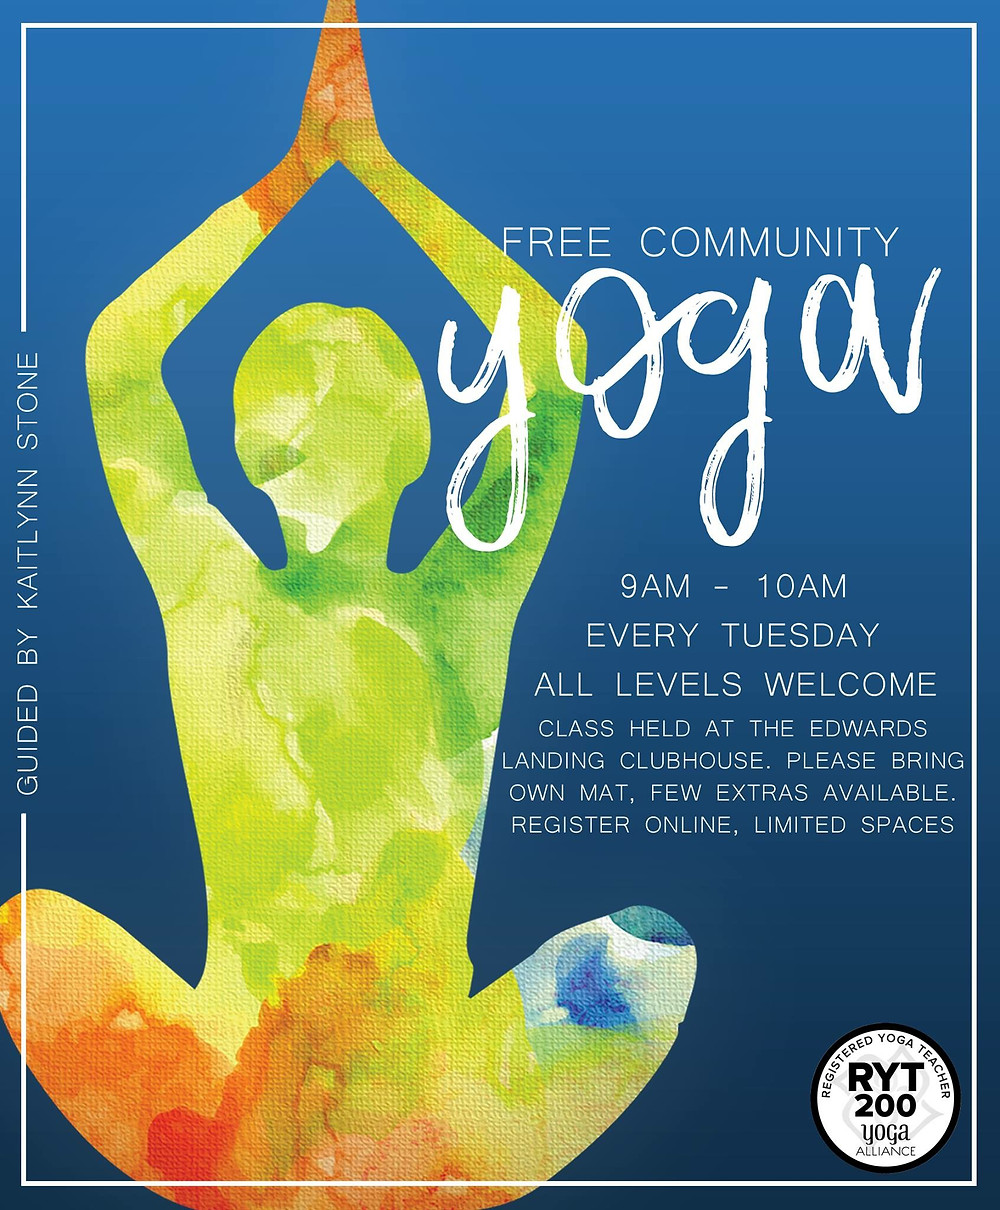 Kaitlynn Stone Free Community Yoga Class Flyer Design